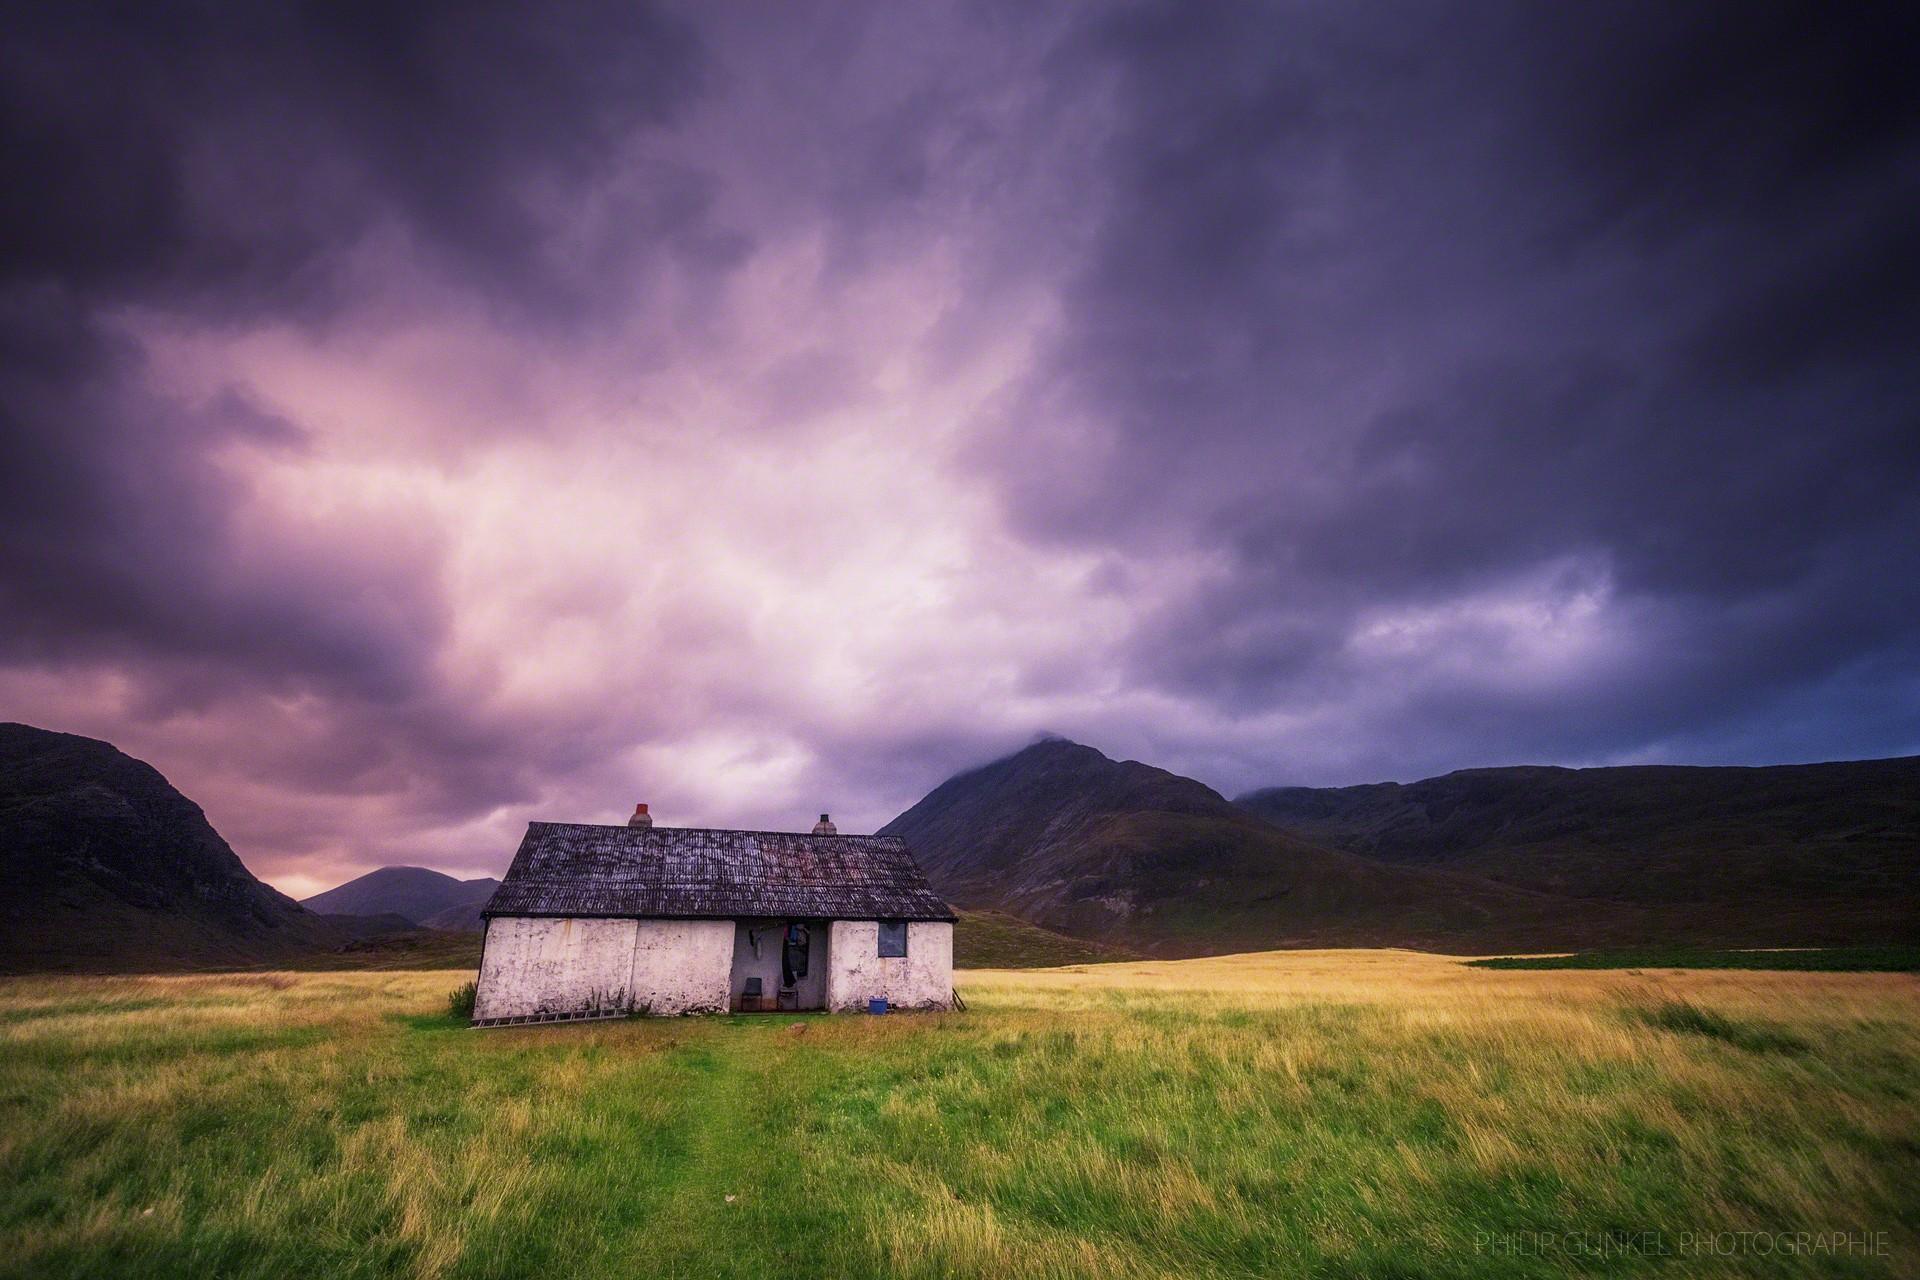 scotland_philip_gunkel_photographie_www.philipgunkel.de38